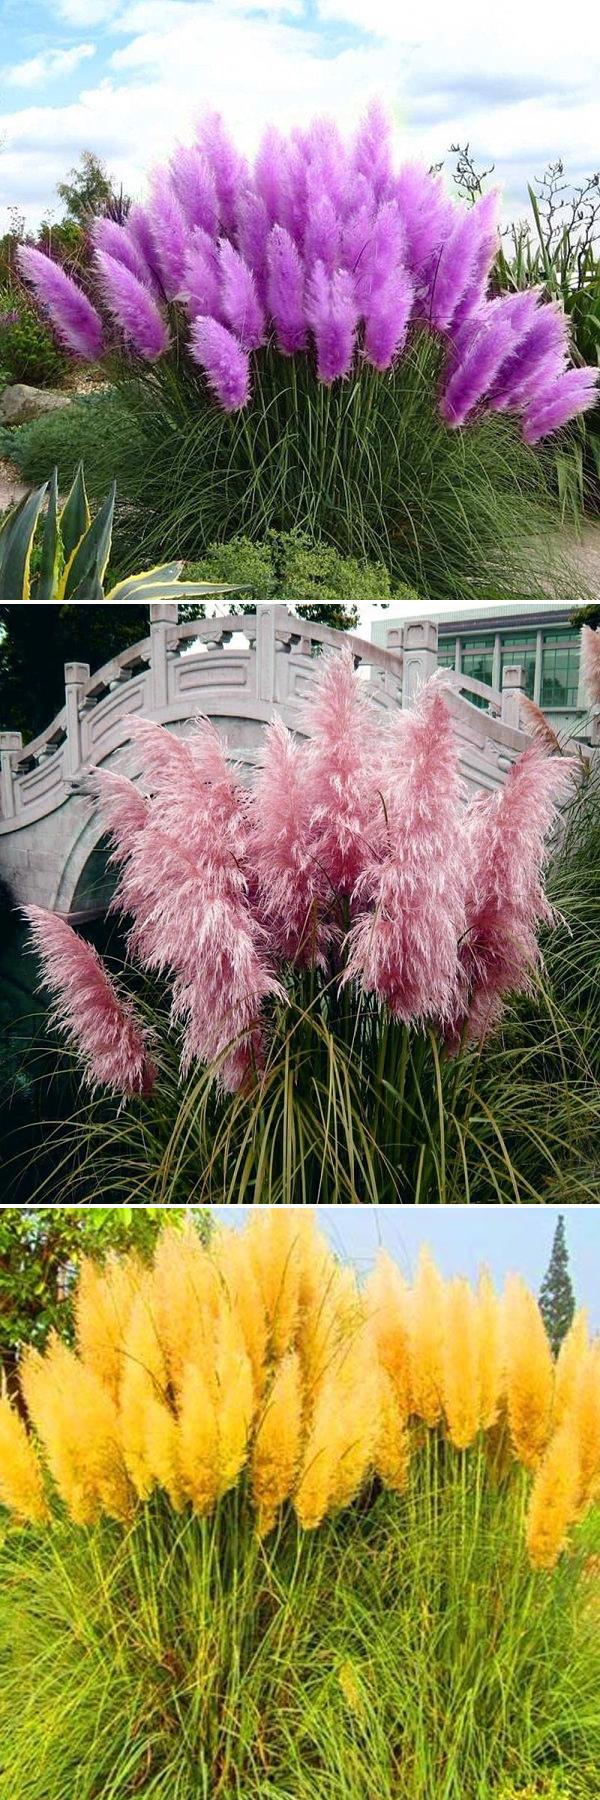 US$2.39 200Pcs Pampas Grass Seed Potted Ornamental Plants Purple Pampas Grass Garden Bonsai